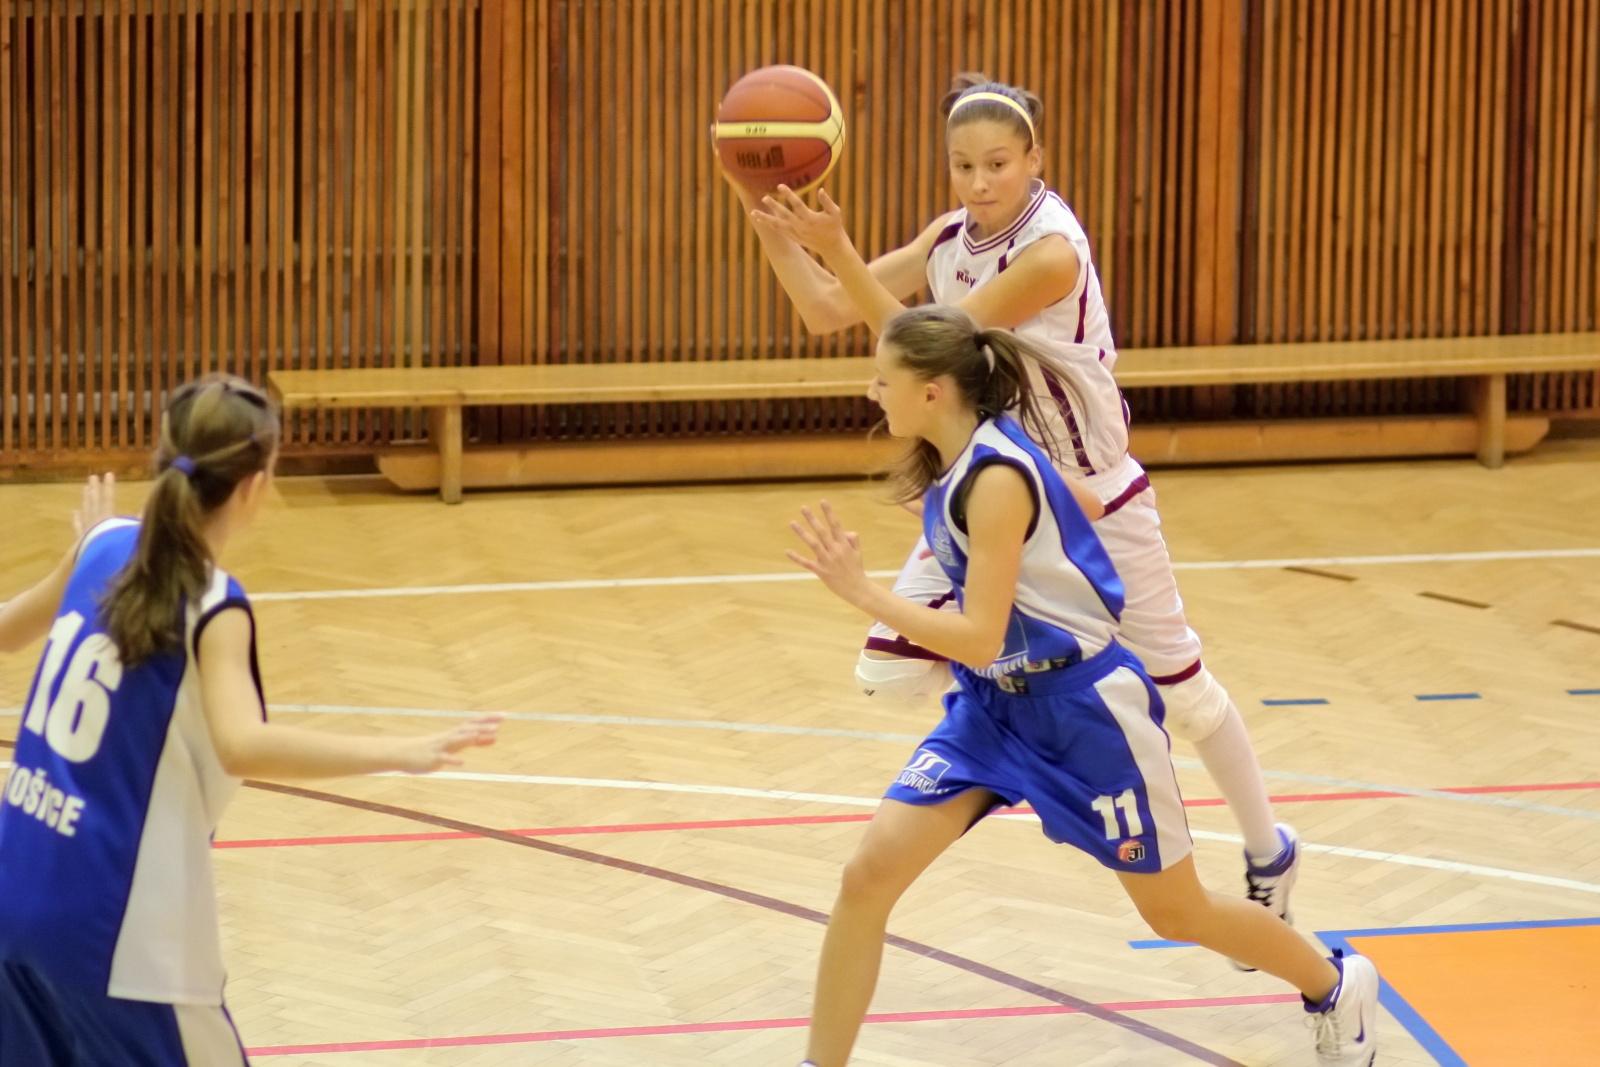 bk-zvolen-abovia-kosice-ziacky-basketbal-2011-15